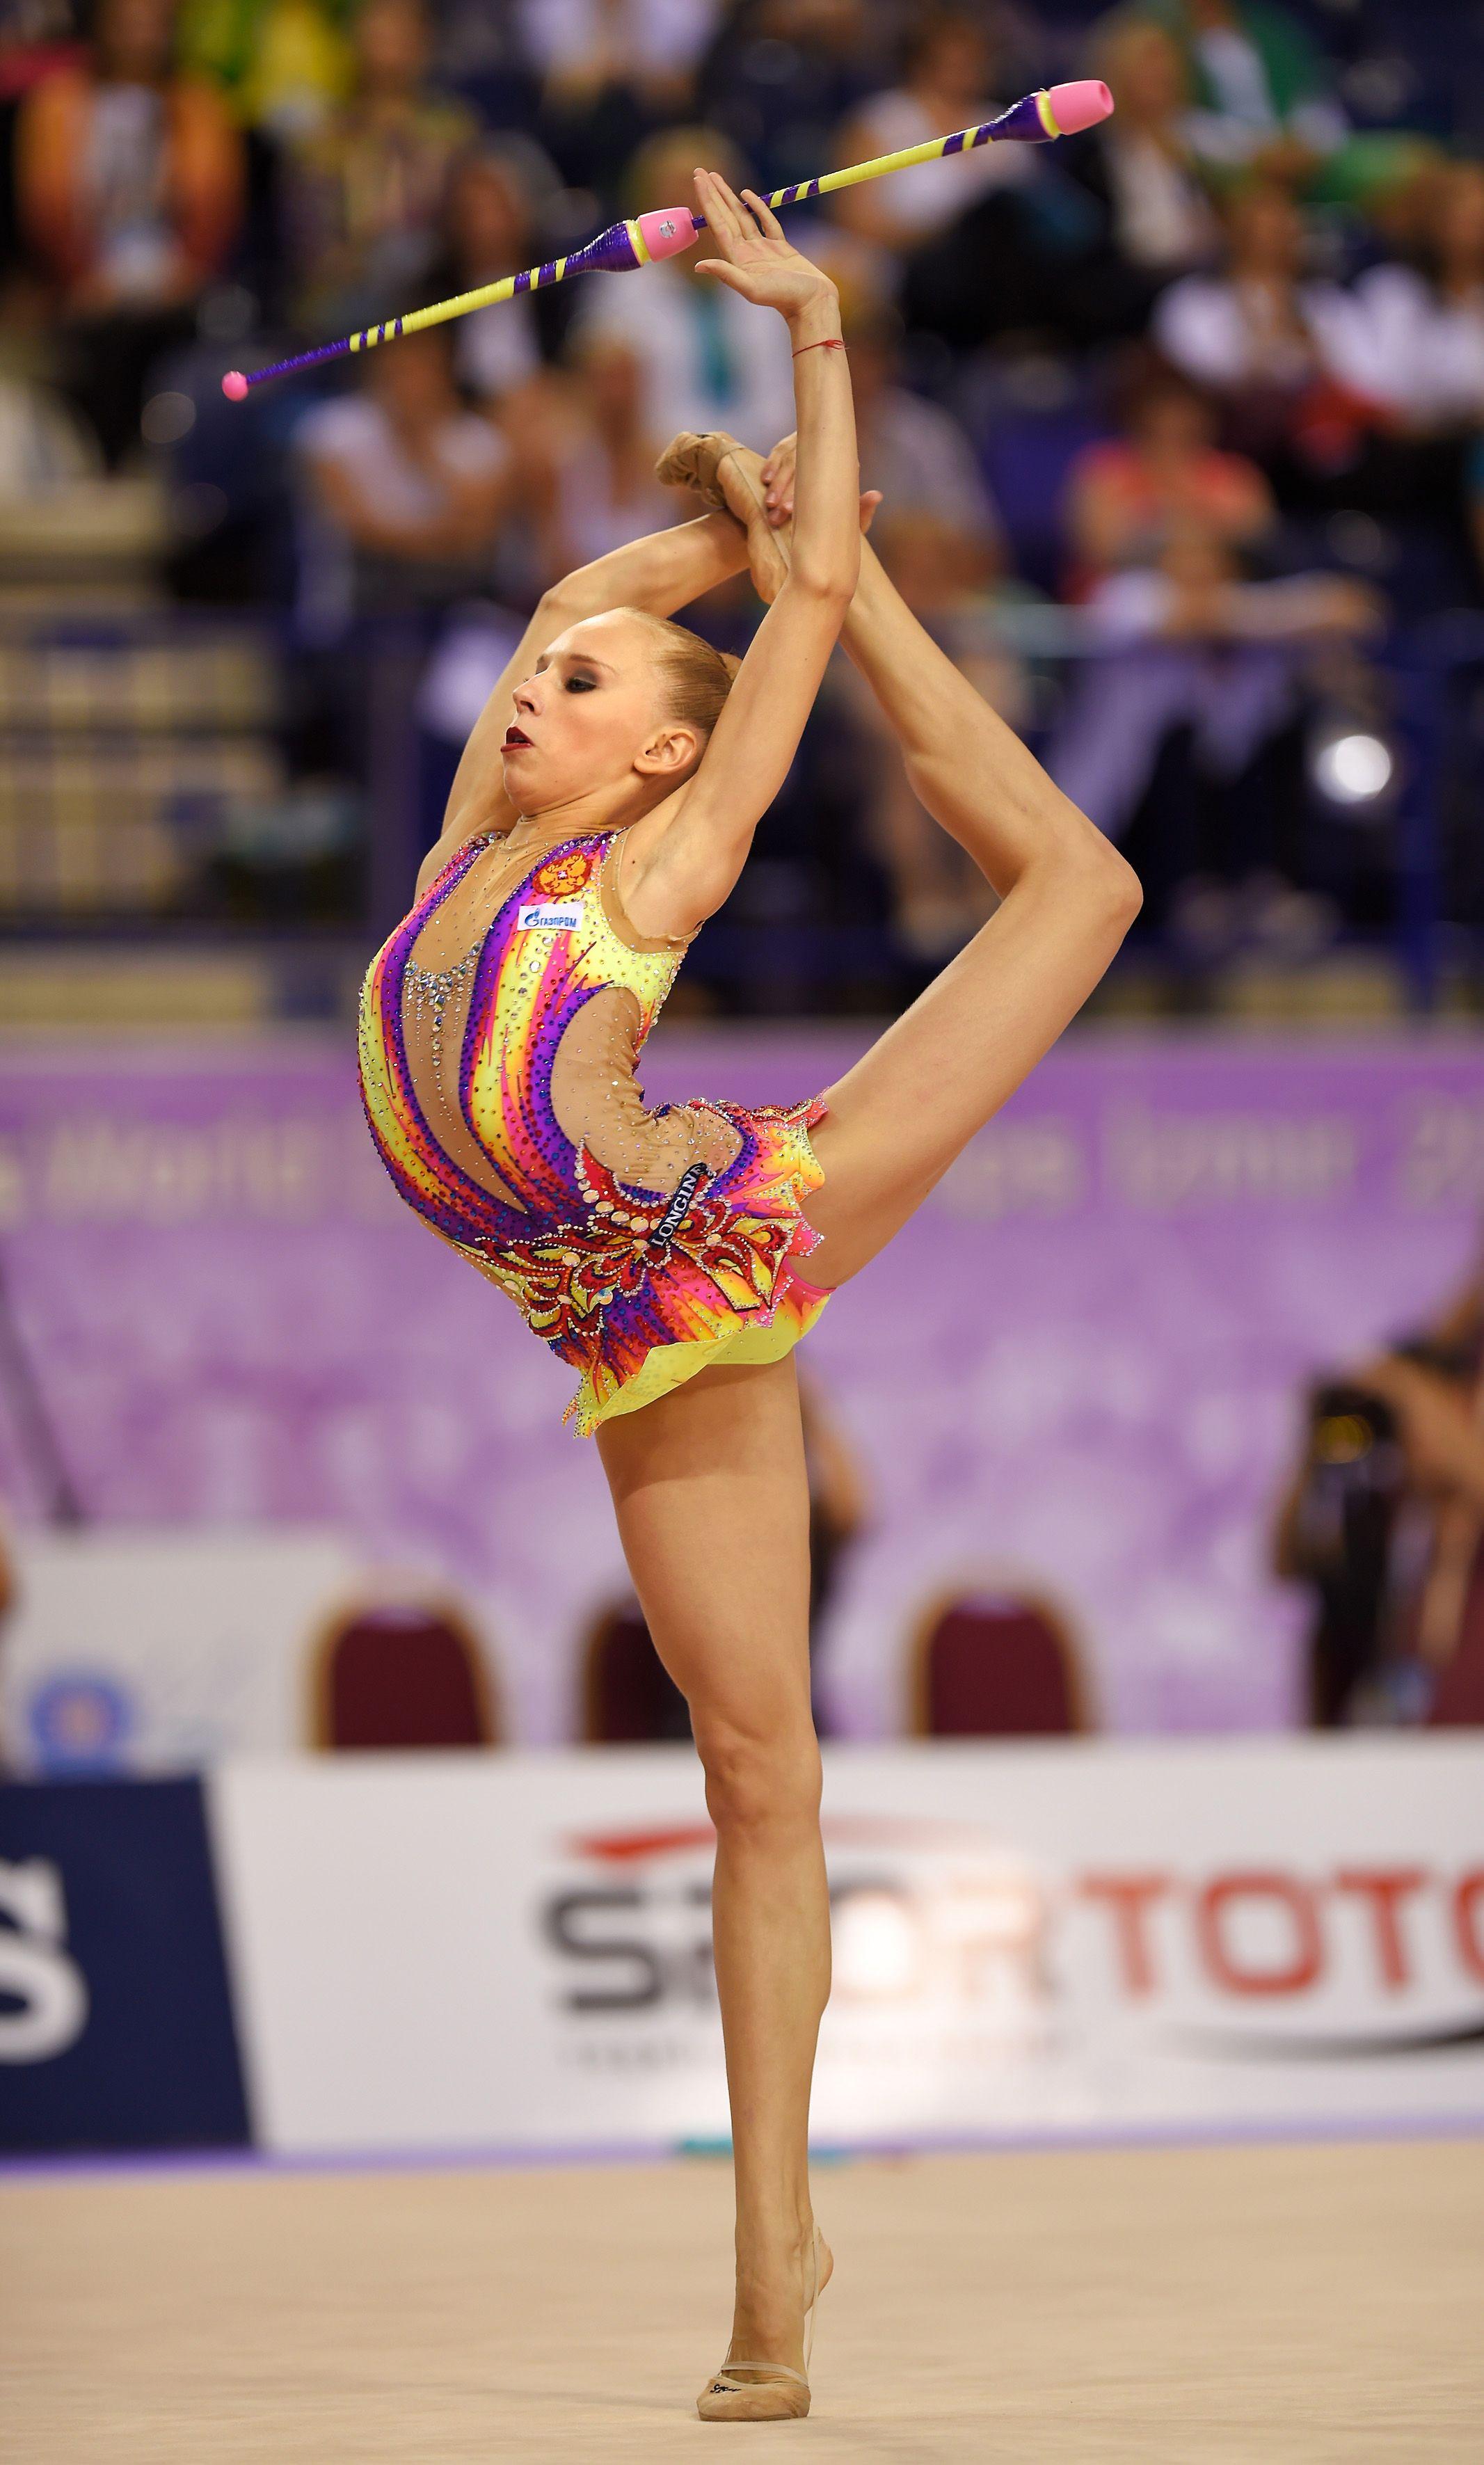 Daria Dmitrieva: gymnast, mom and just a beautiful woman